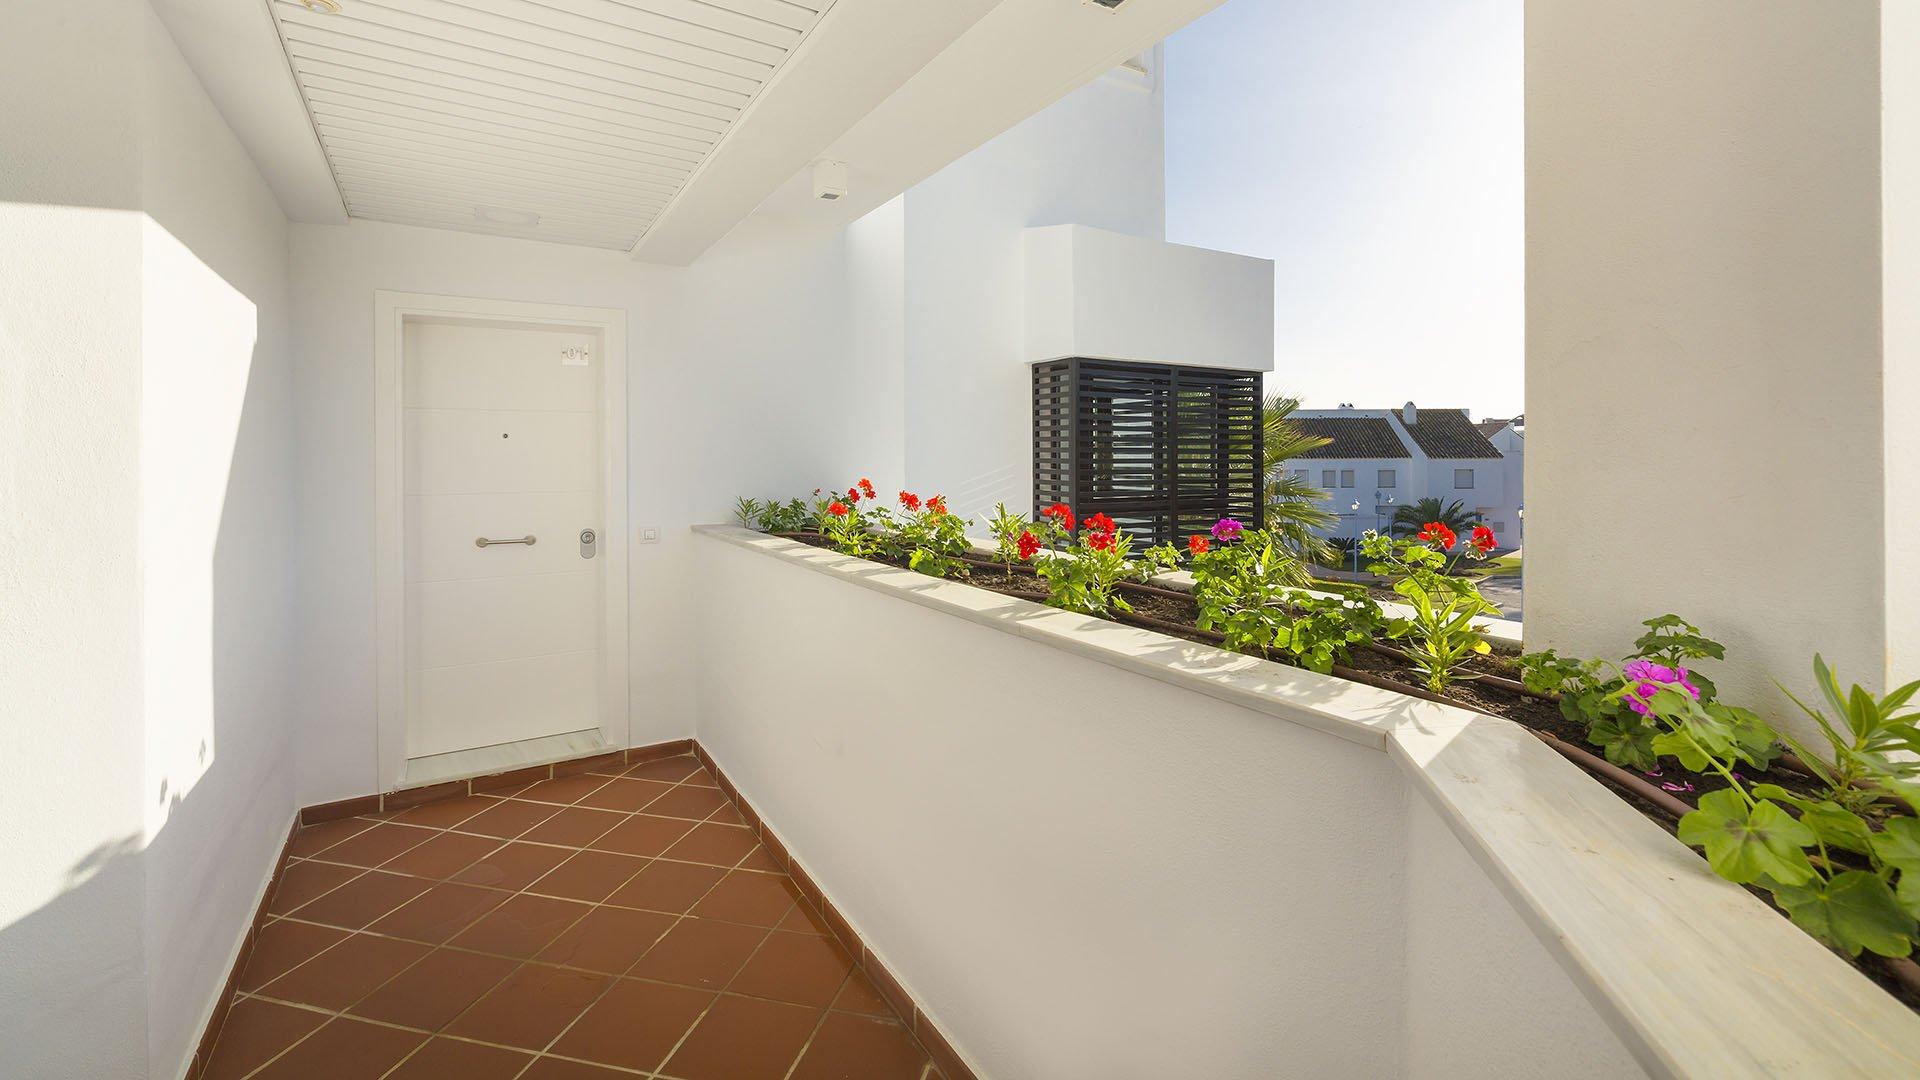 Casas del Mar: Residential apartments close to the beach